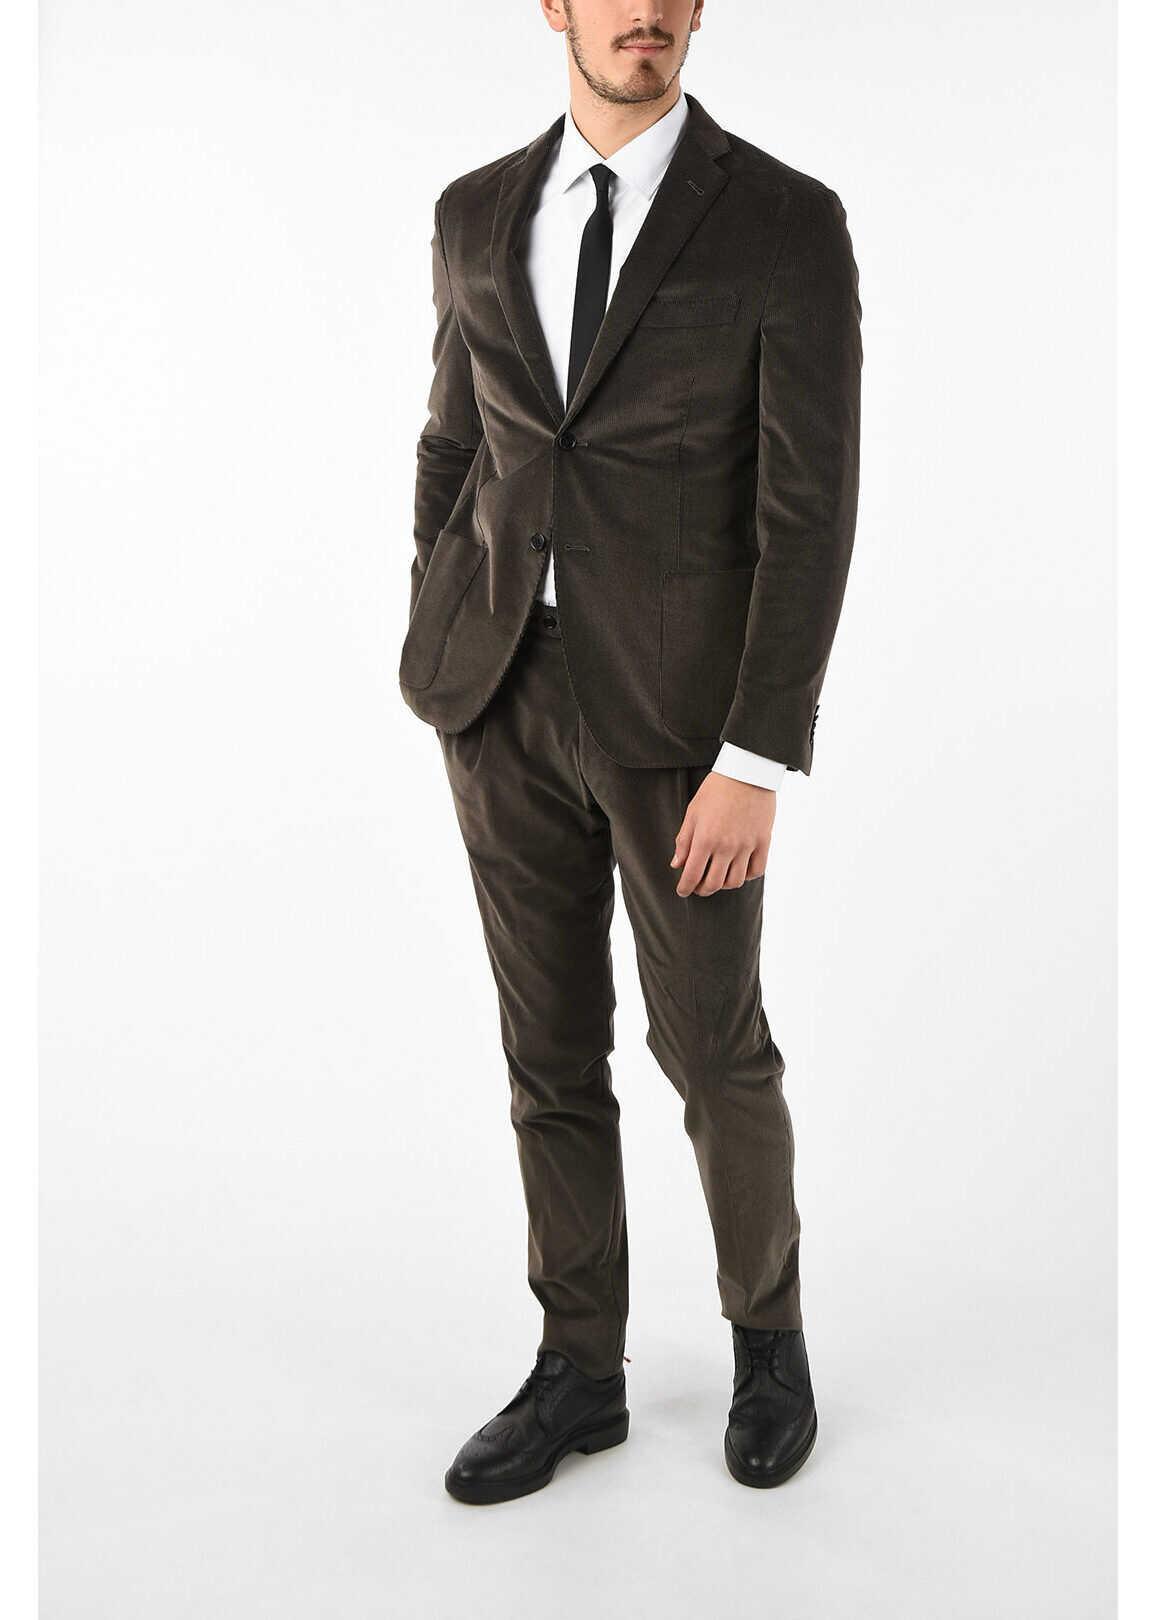 CORNELIANI notch lapel corduroy drop 7R 2-button GATE suit BROWN imagine